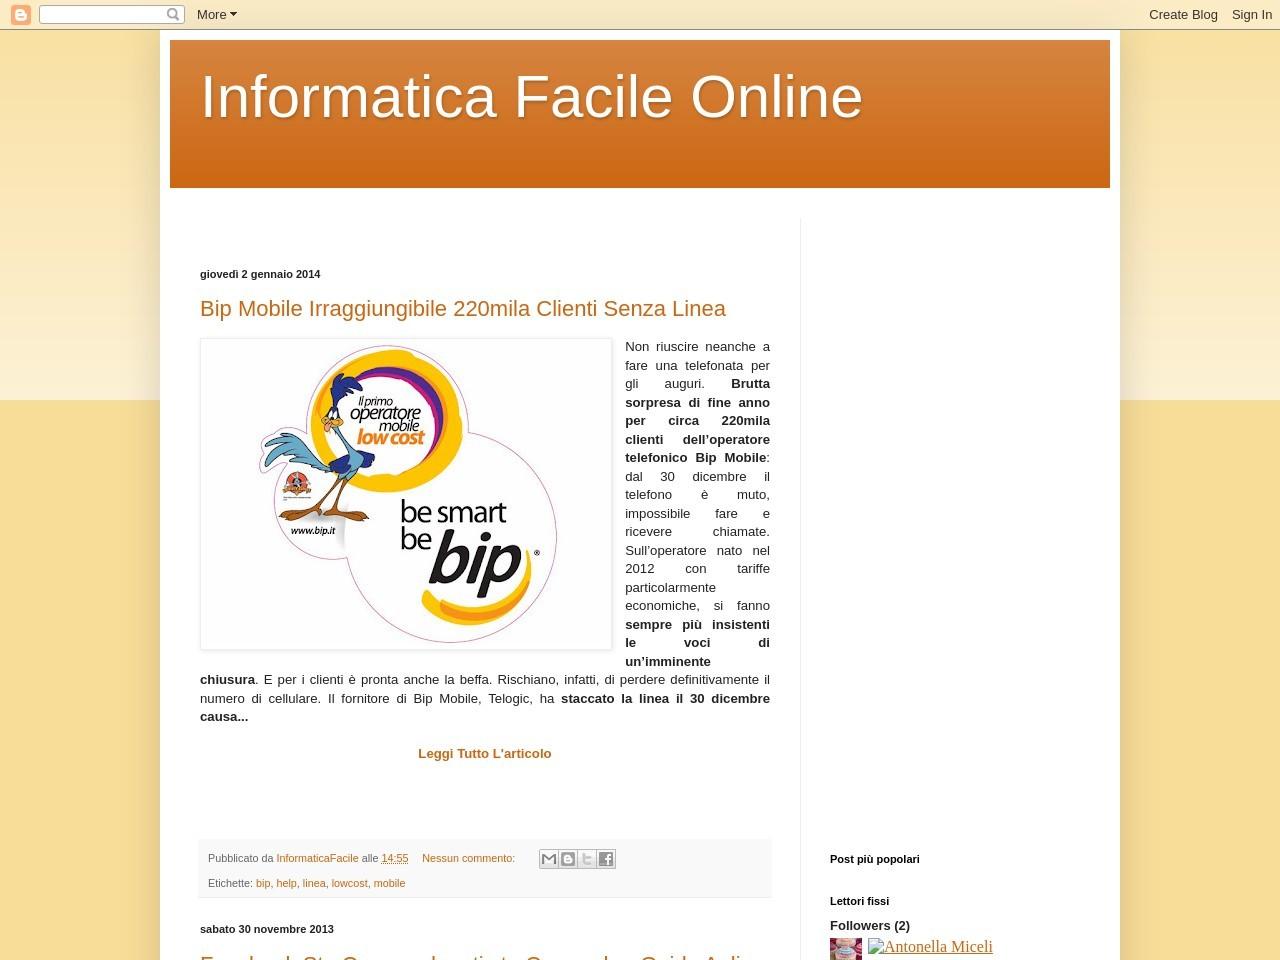 informatica-facile-online